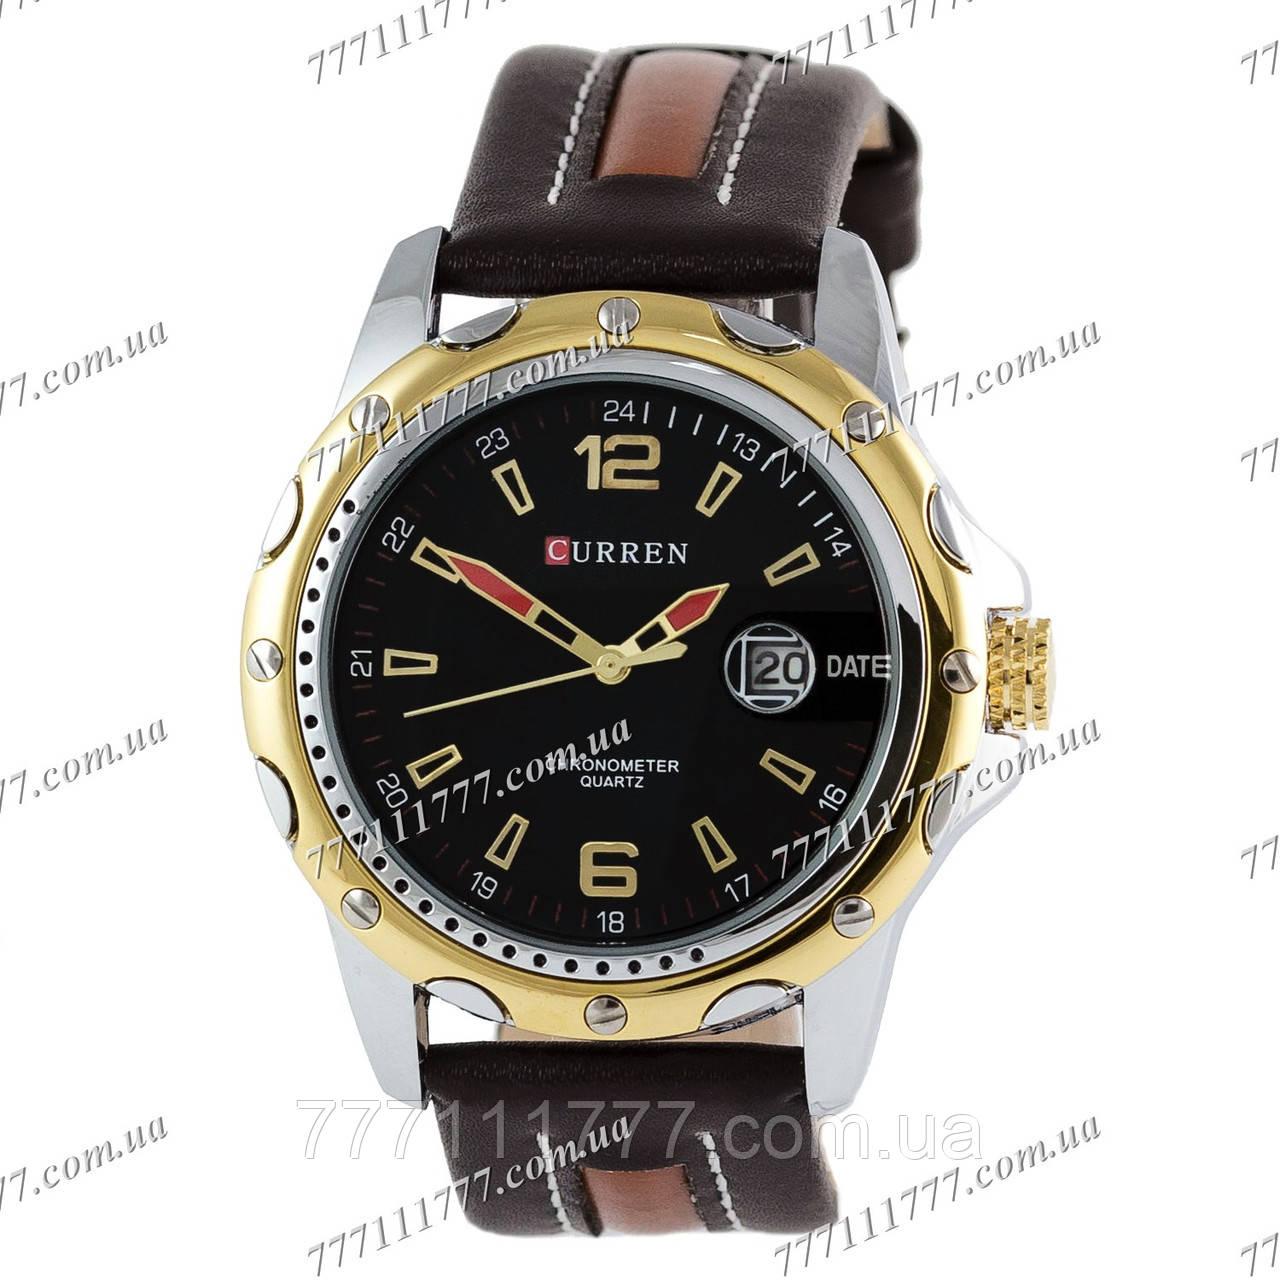 73a6c139c7ef Часы мужские наручные Curren Line 8104 Gold-Black  продажа, цена в ...